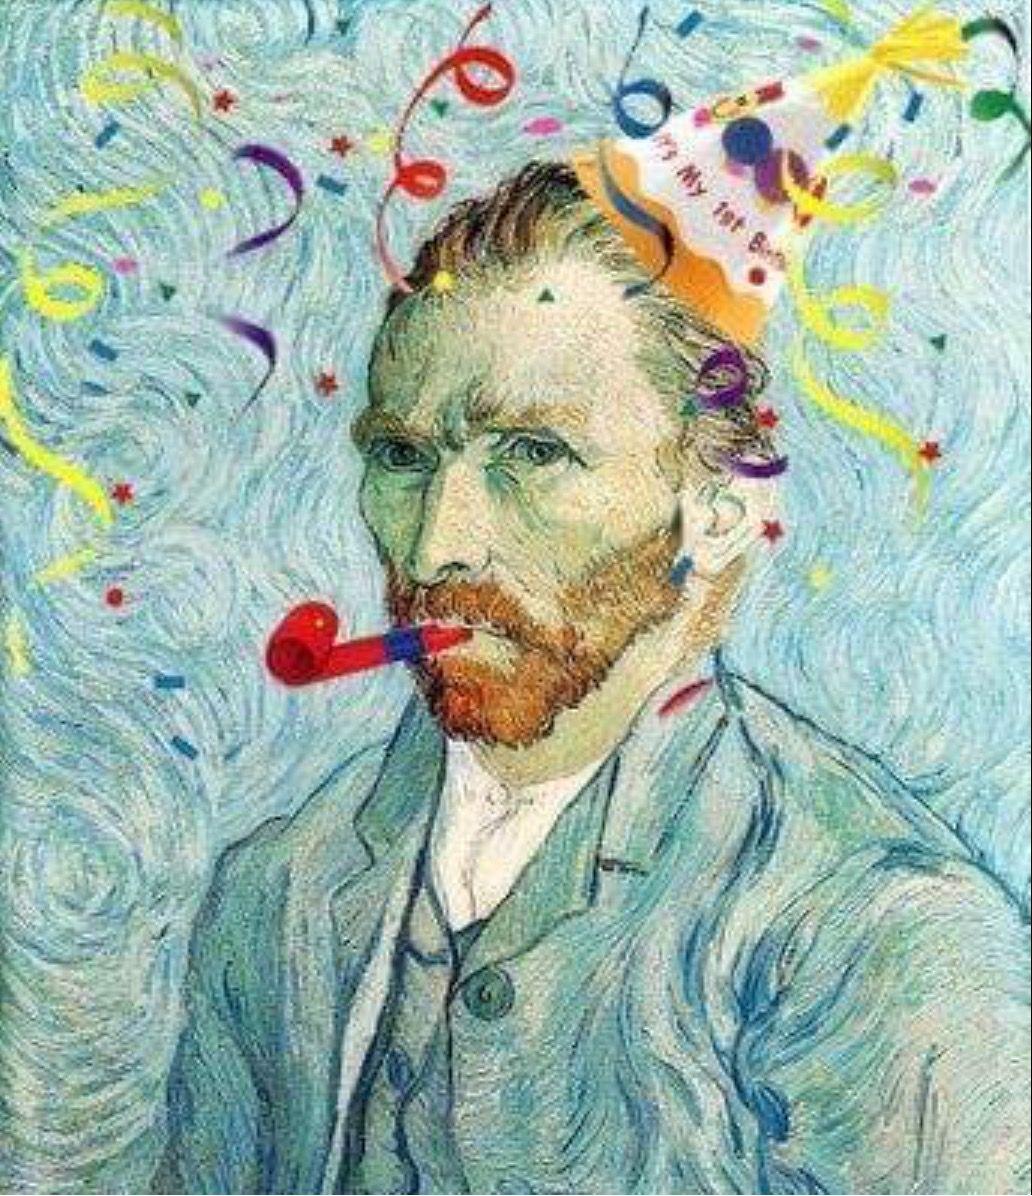 Happy Birthday Van Gogh!